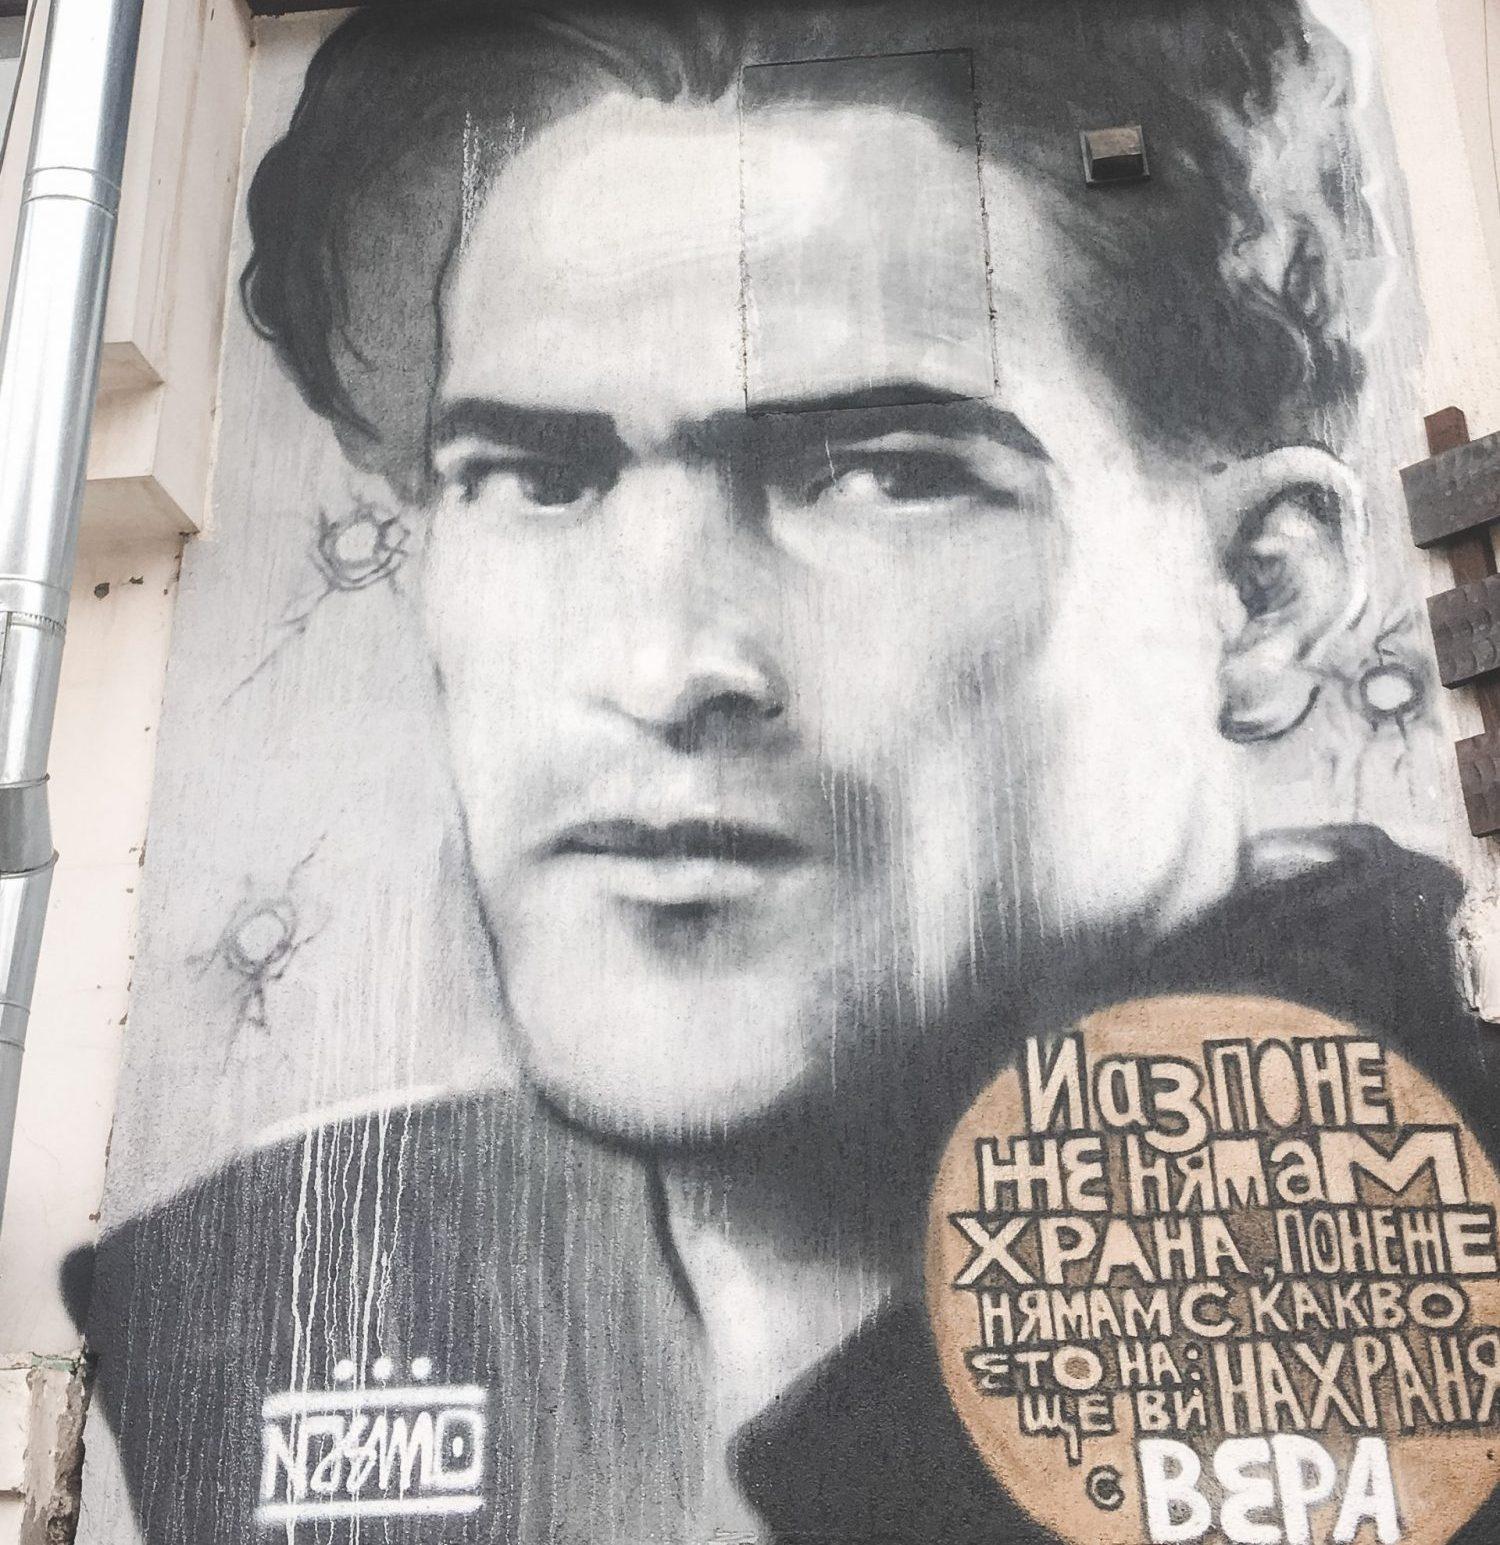 Nikola Vaptsarov graffiti art in Bansko, Bulgaria. Nikola Vaptsarov was a famous Bulgarian poet.